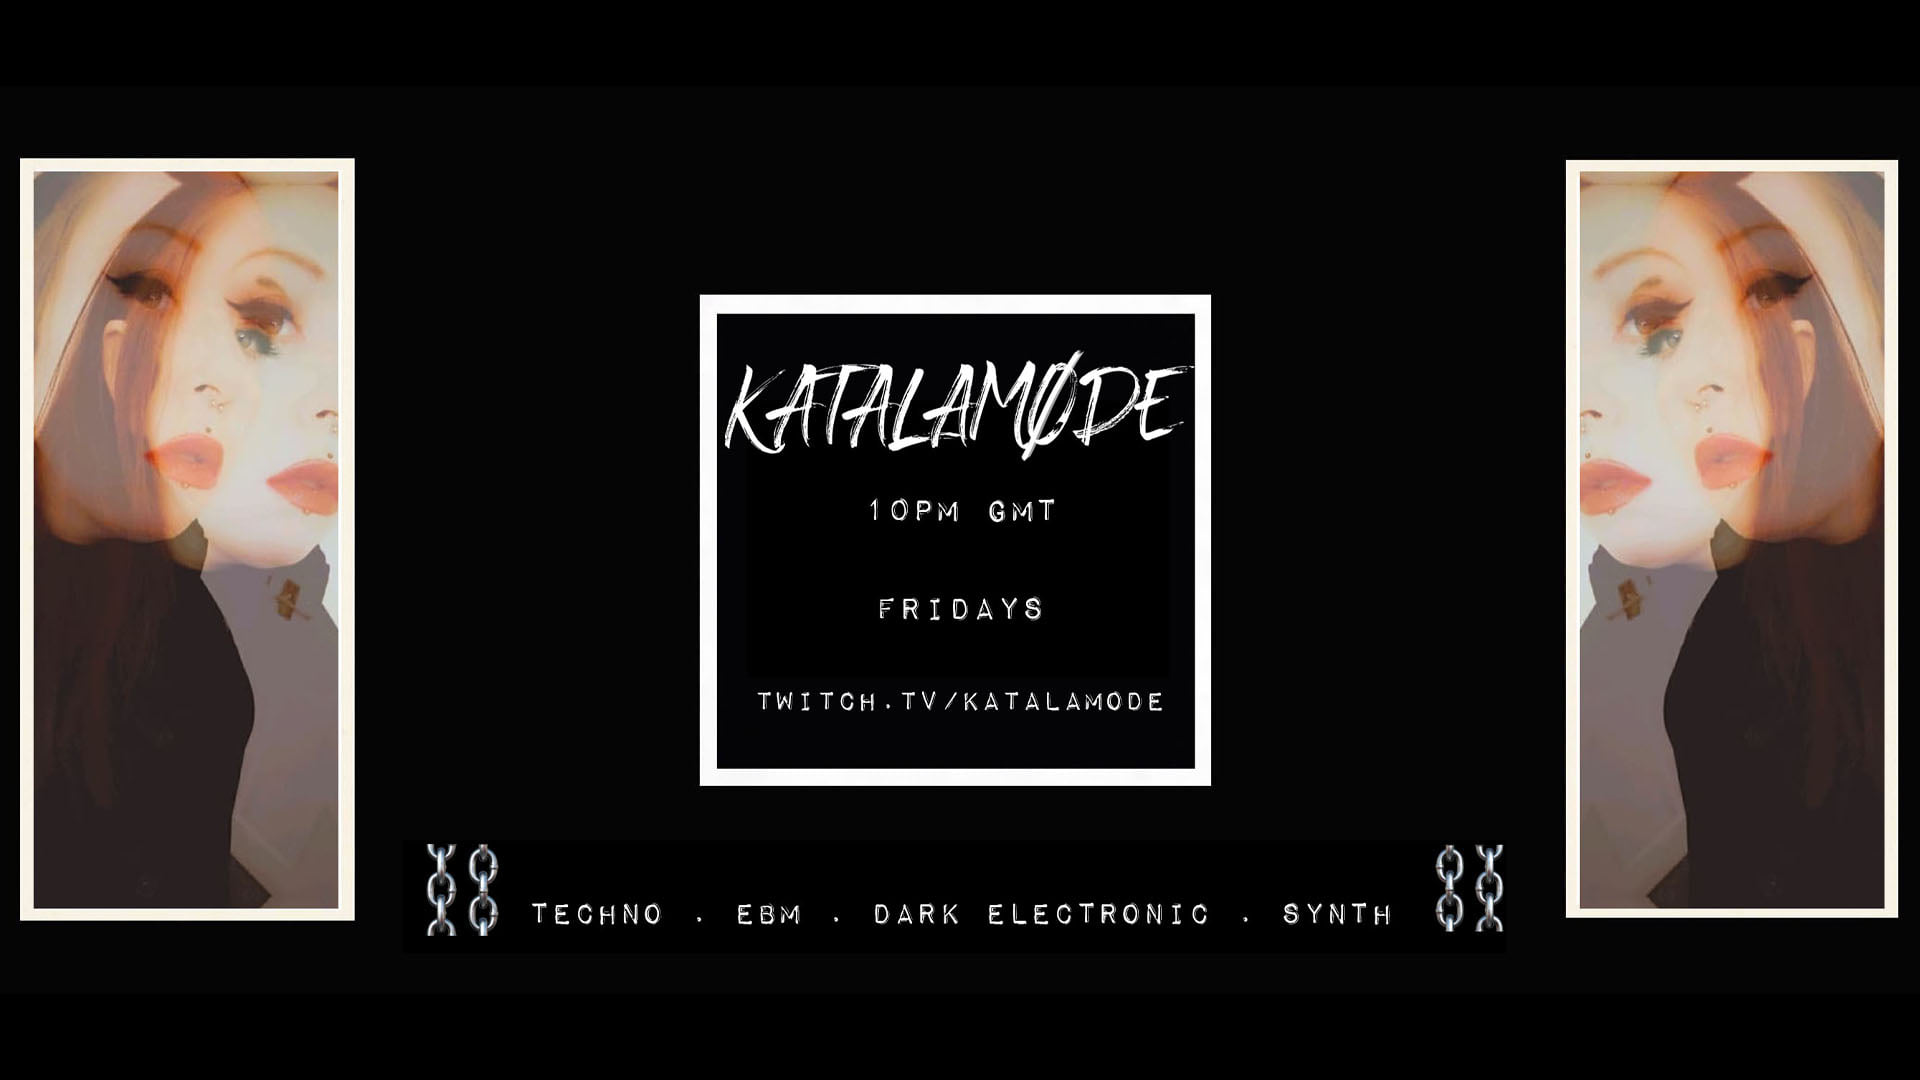 Katalamode